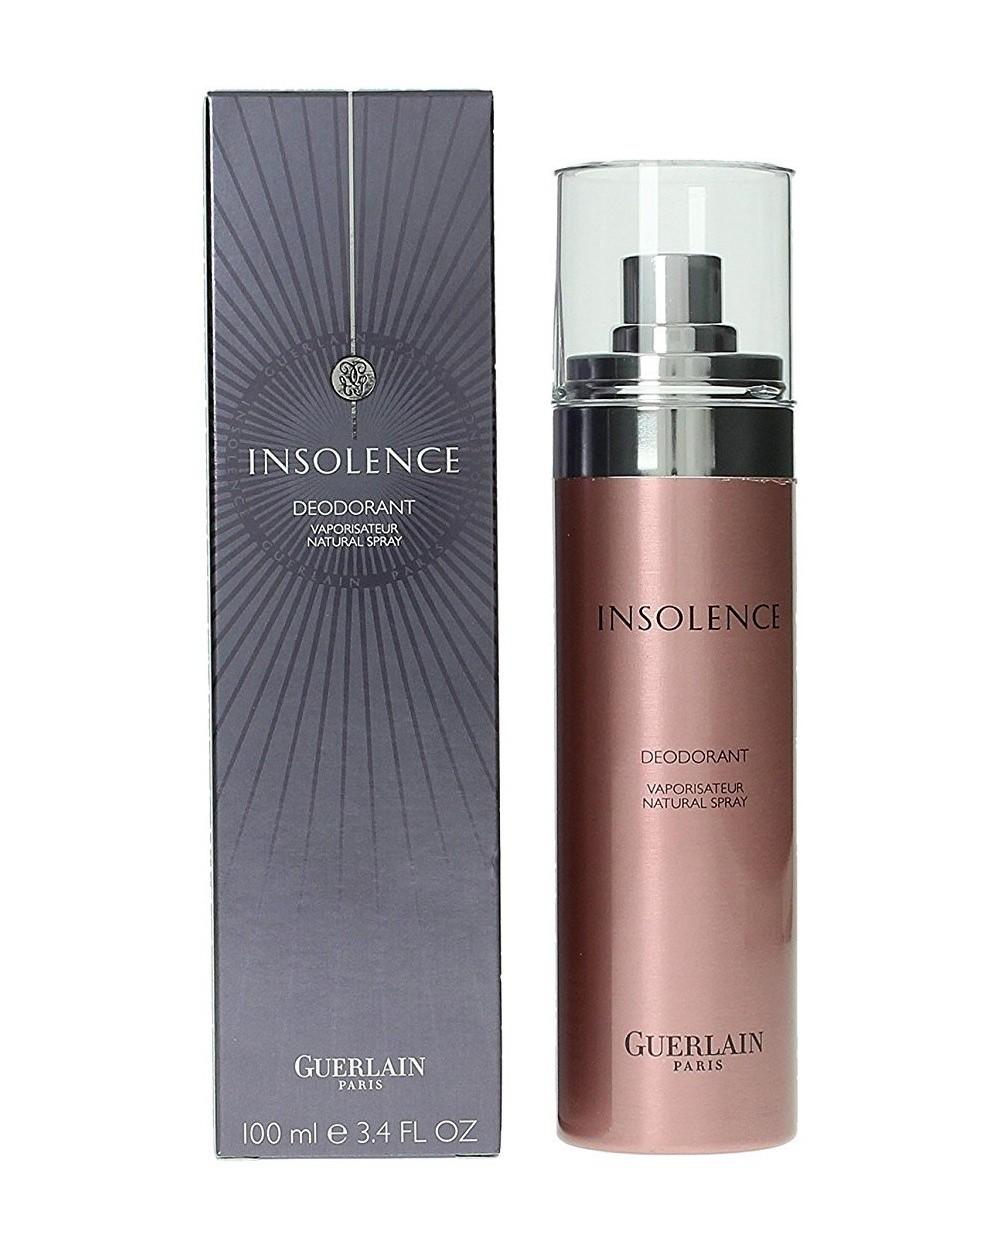 Guerlain Insolence Deodorant Vapo 100ml Sovrana Parfums